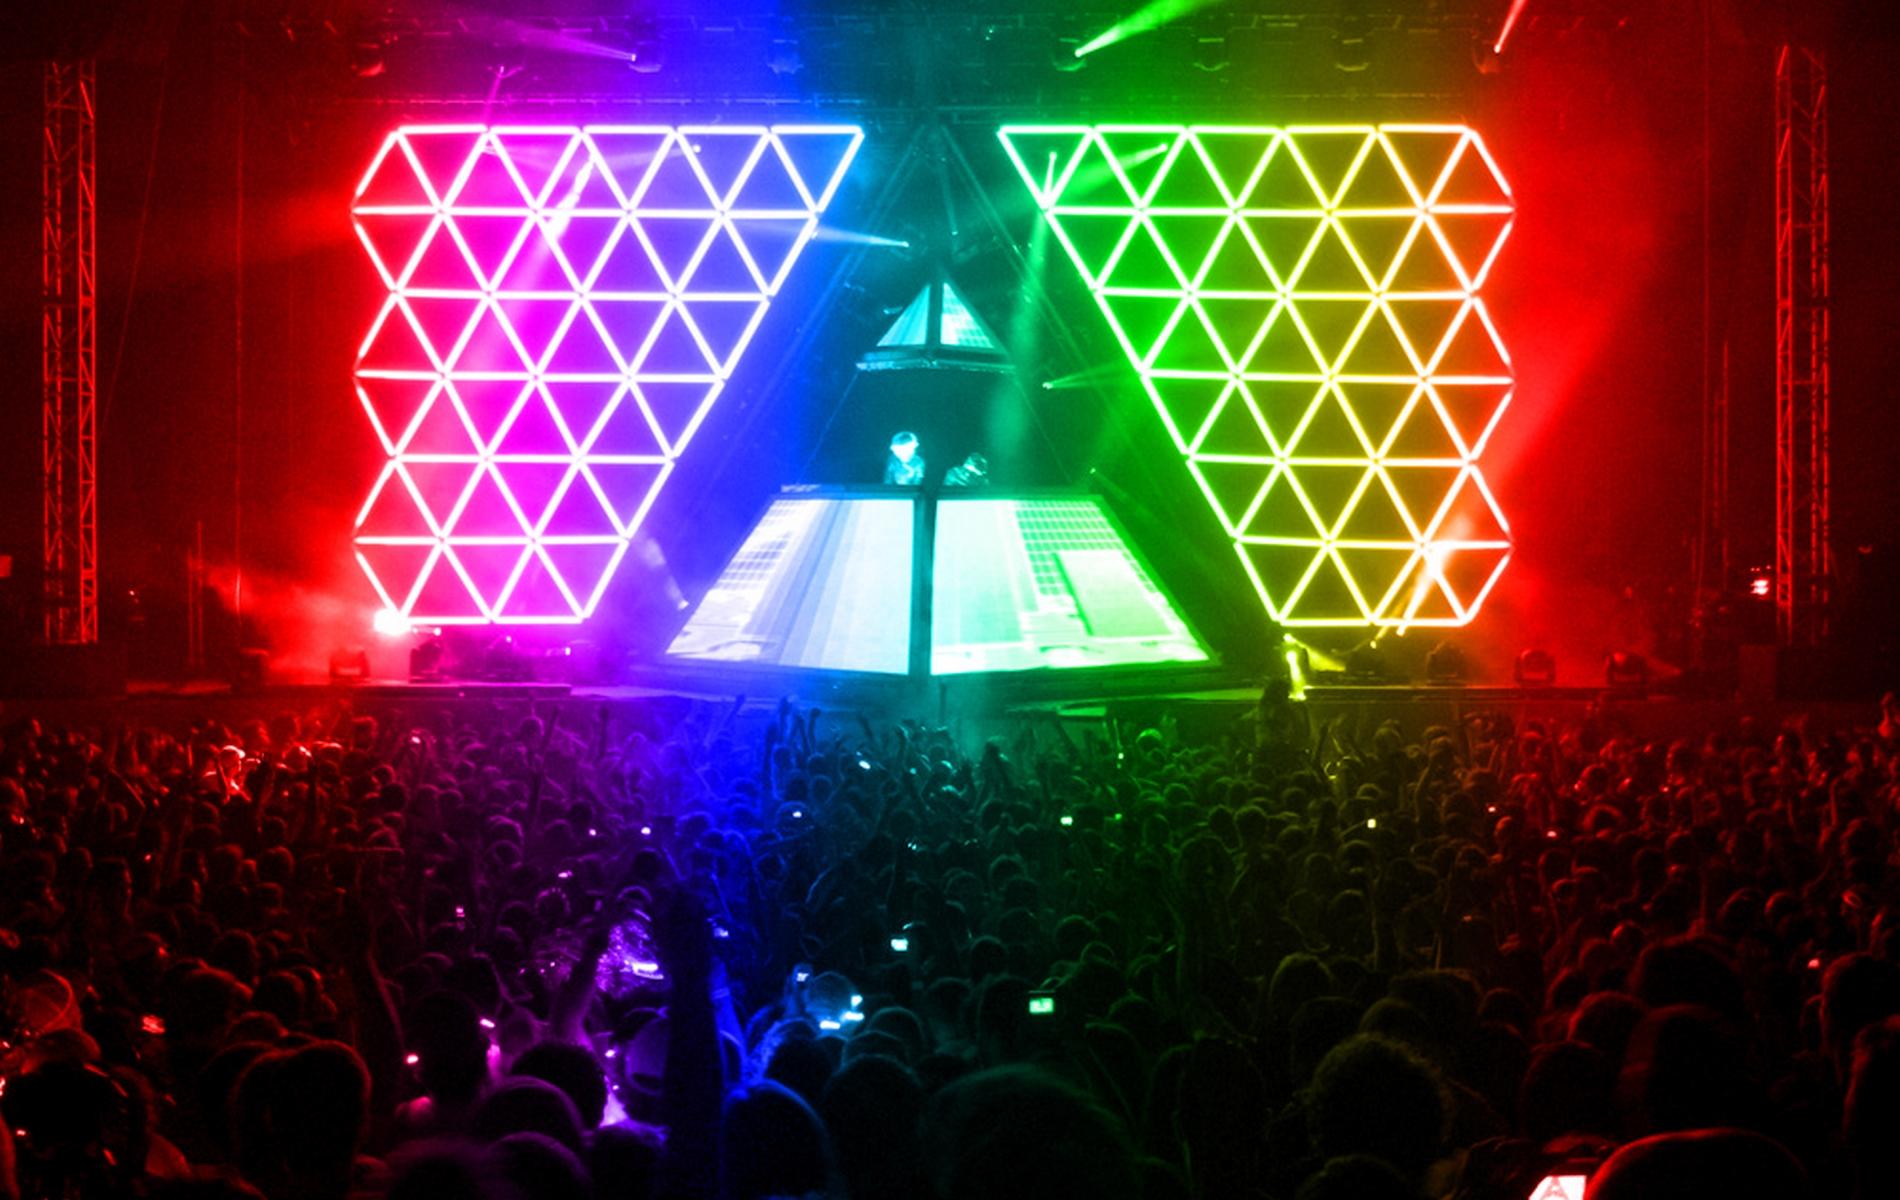 Daft Punk - Alive 2007 Tour